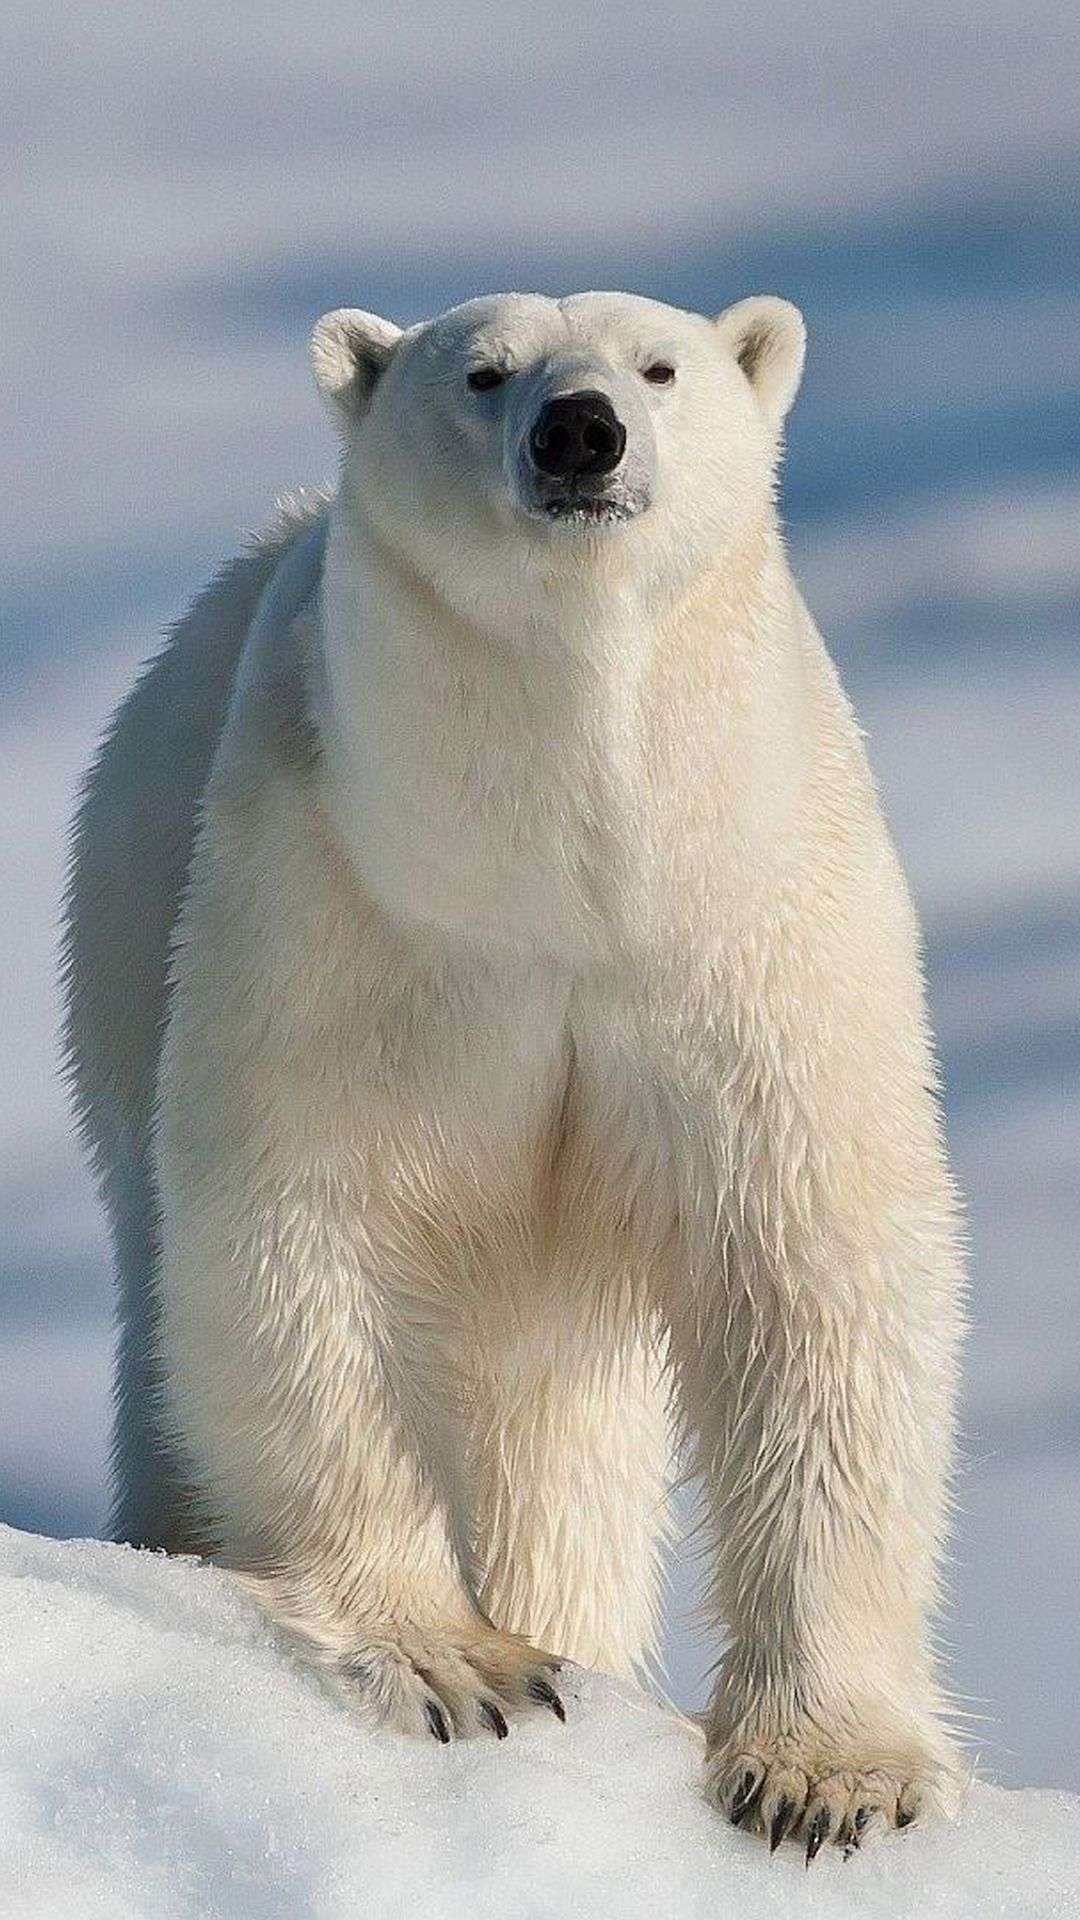 WallpaperFusion-baby-polar-bear-his-dad-Original-1080x1920.jpg